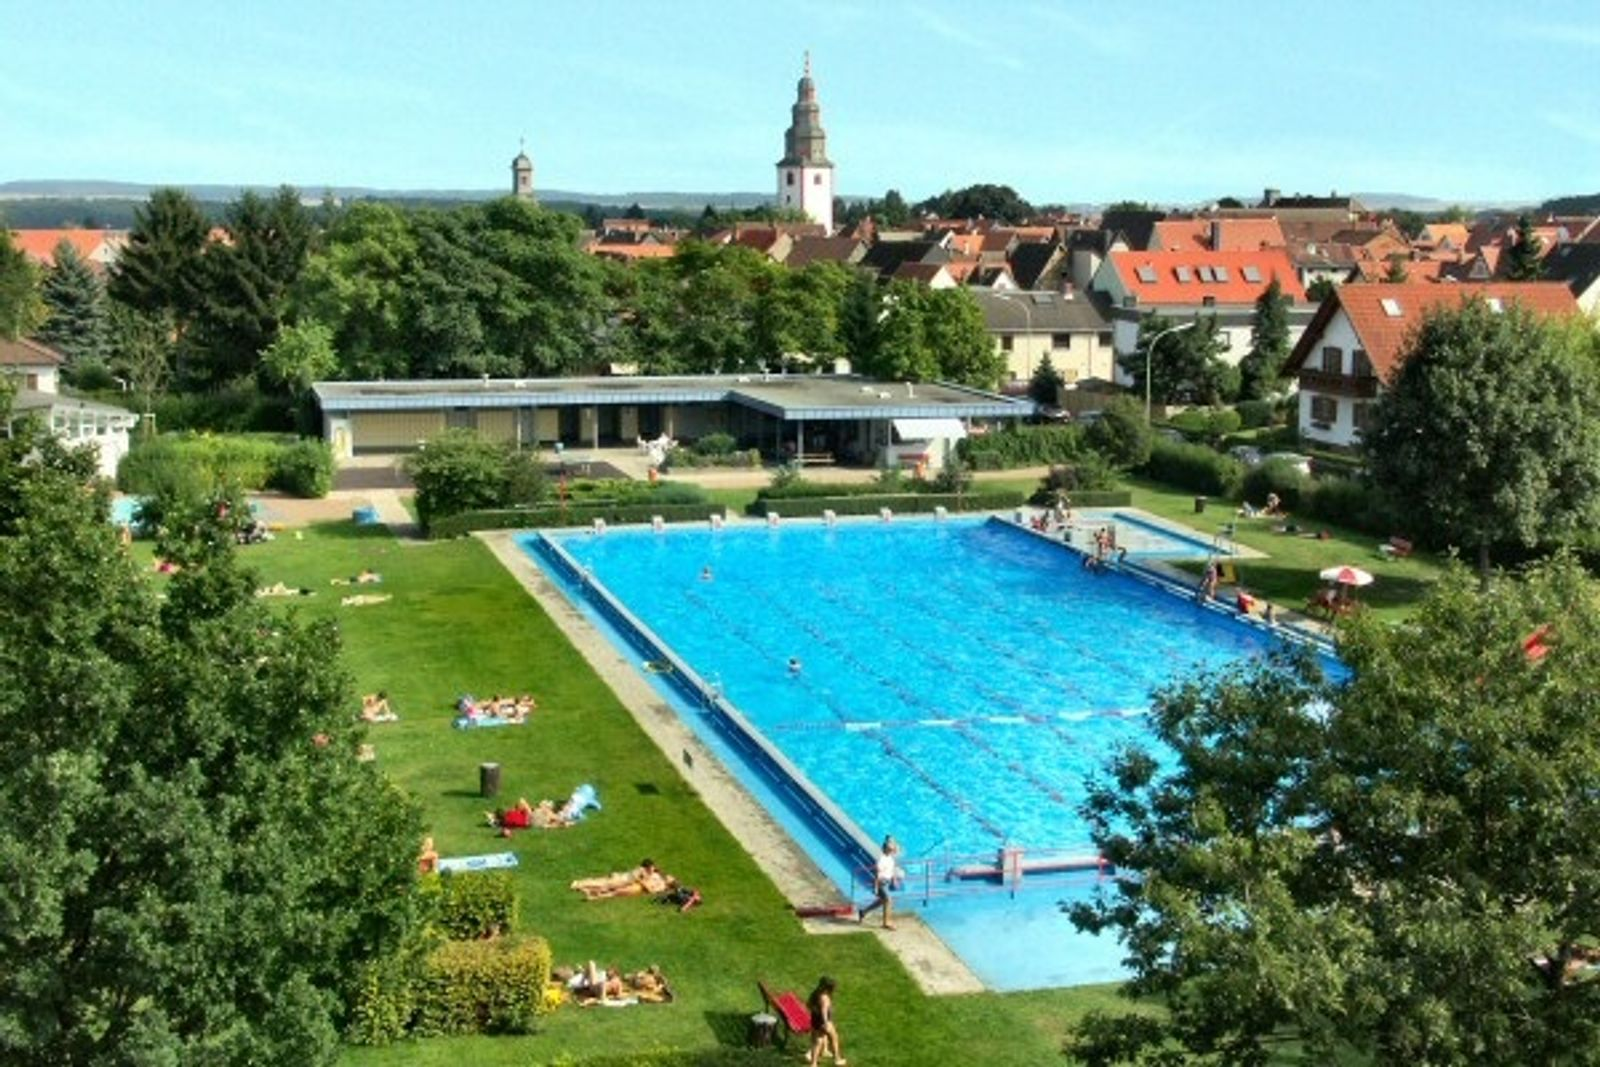 Freibad Rodheim (03.07.2020)